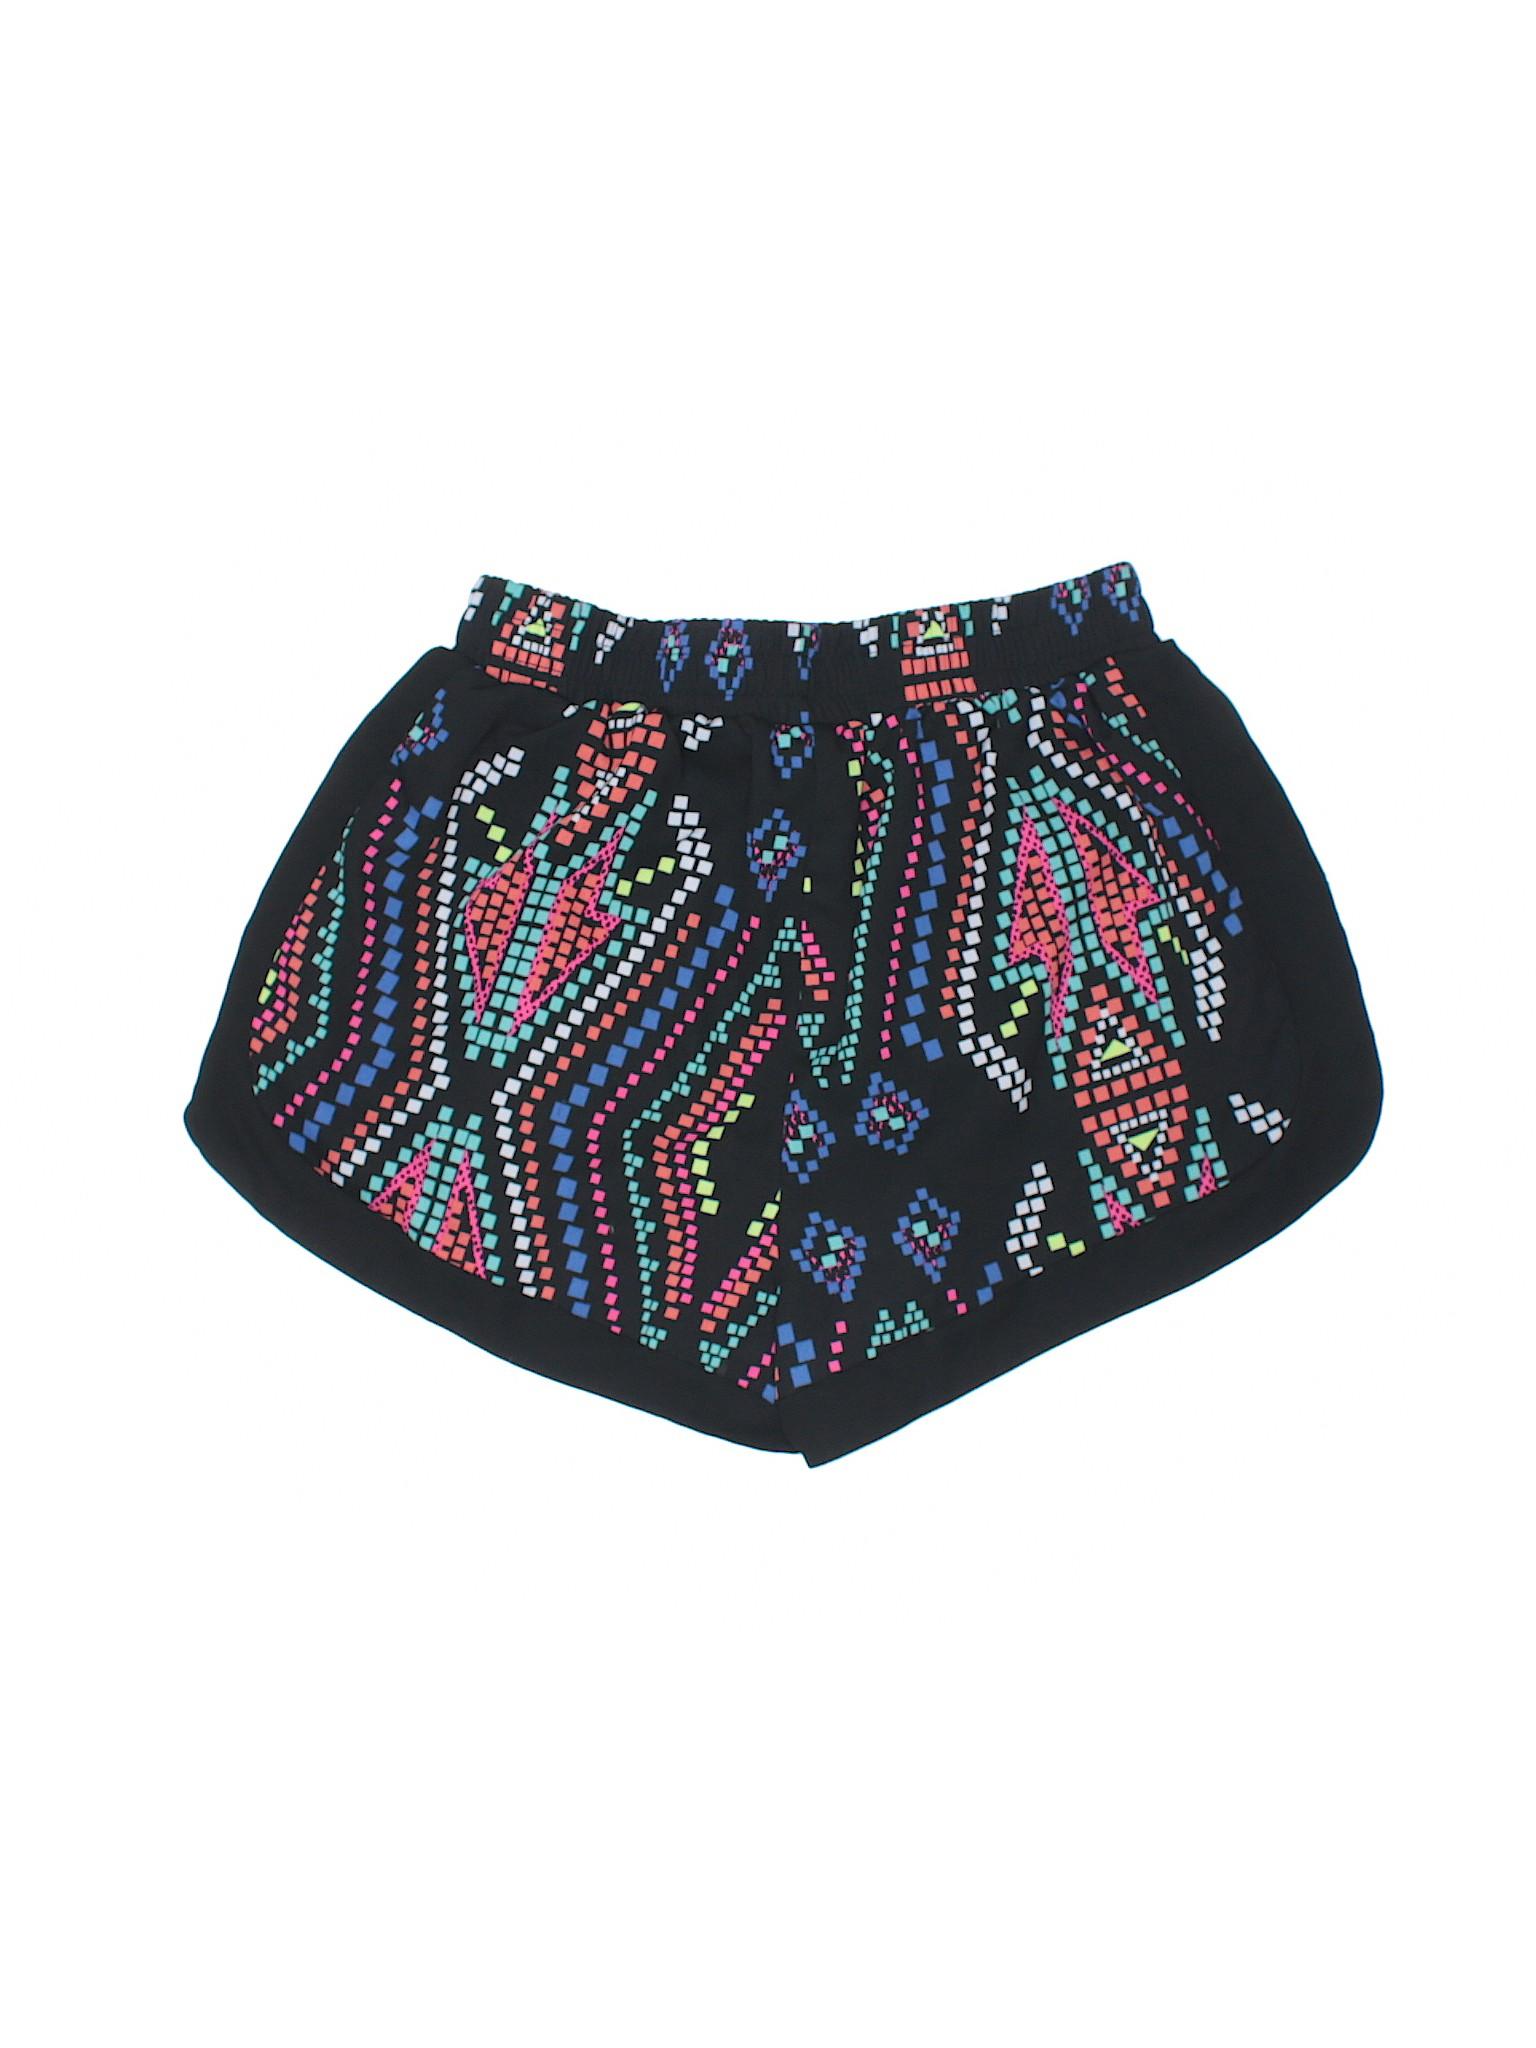 Boutique winter winter Boutique Xhilaration Shorts UdwdZxYqr